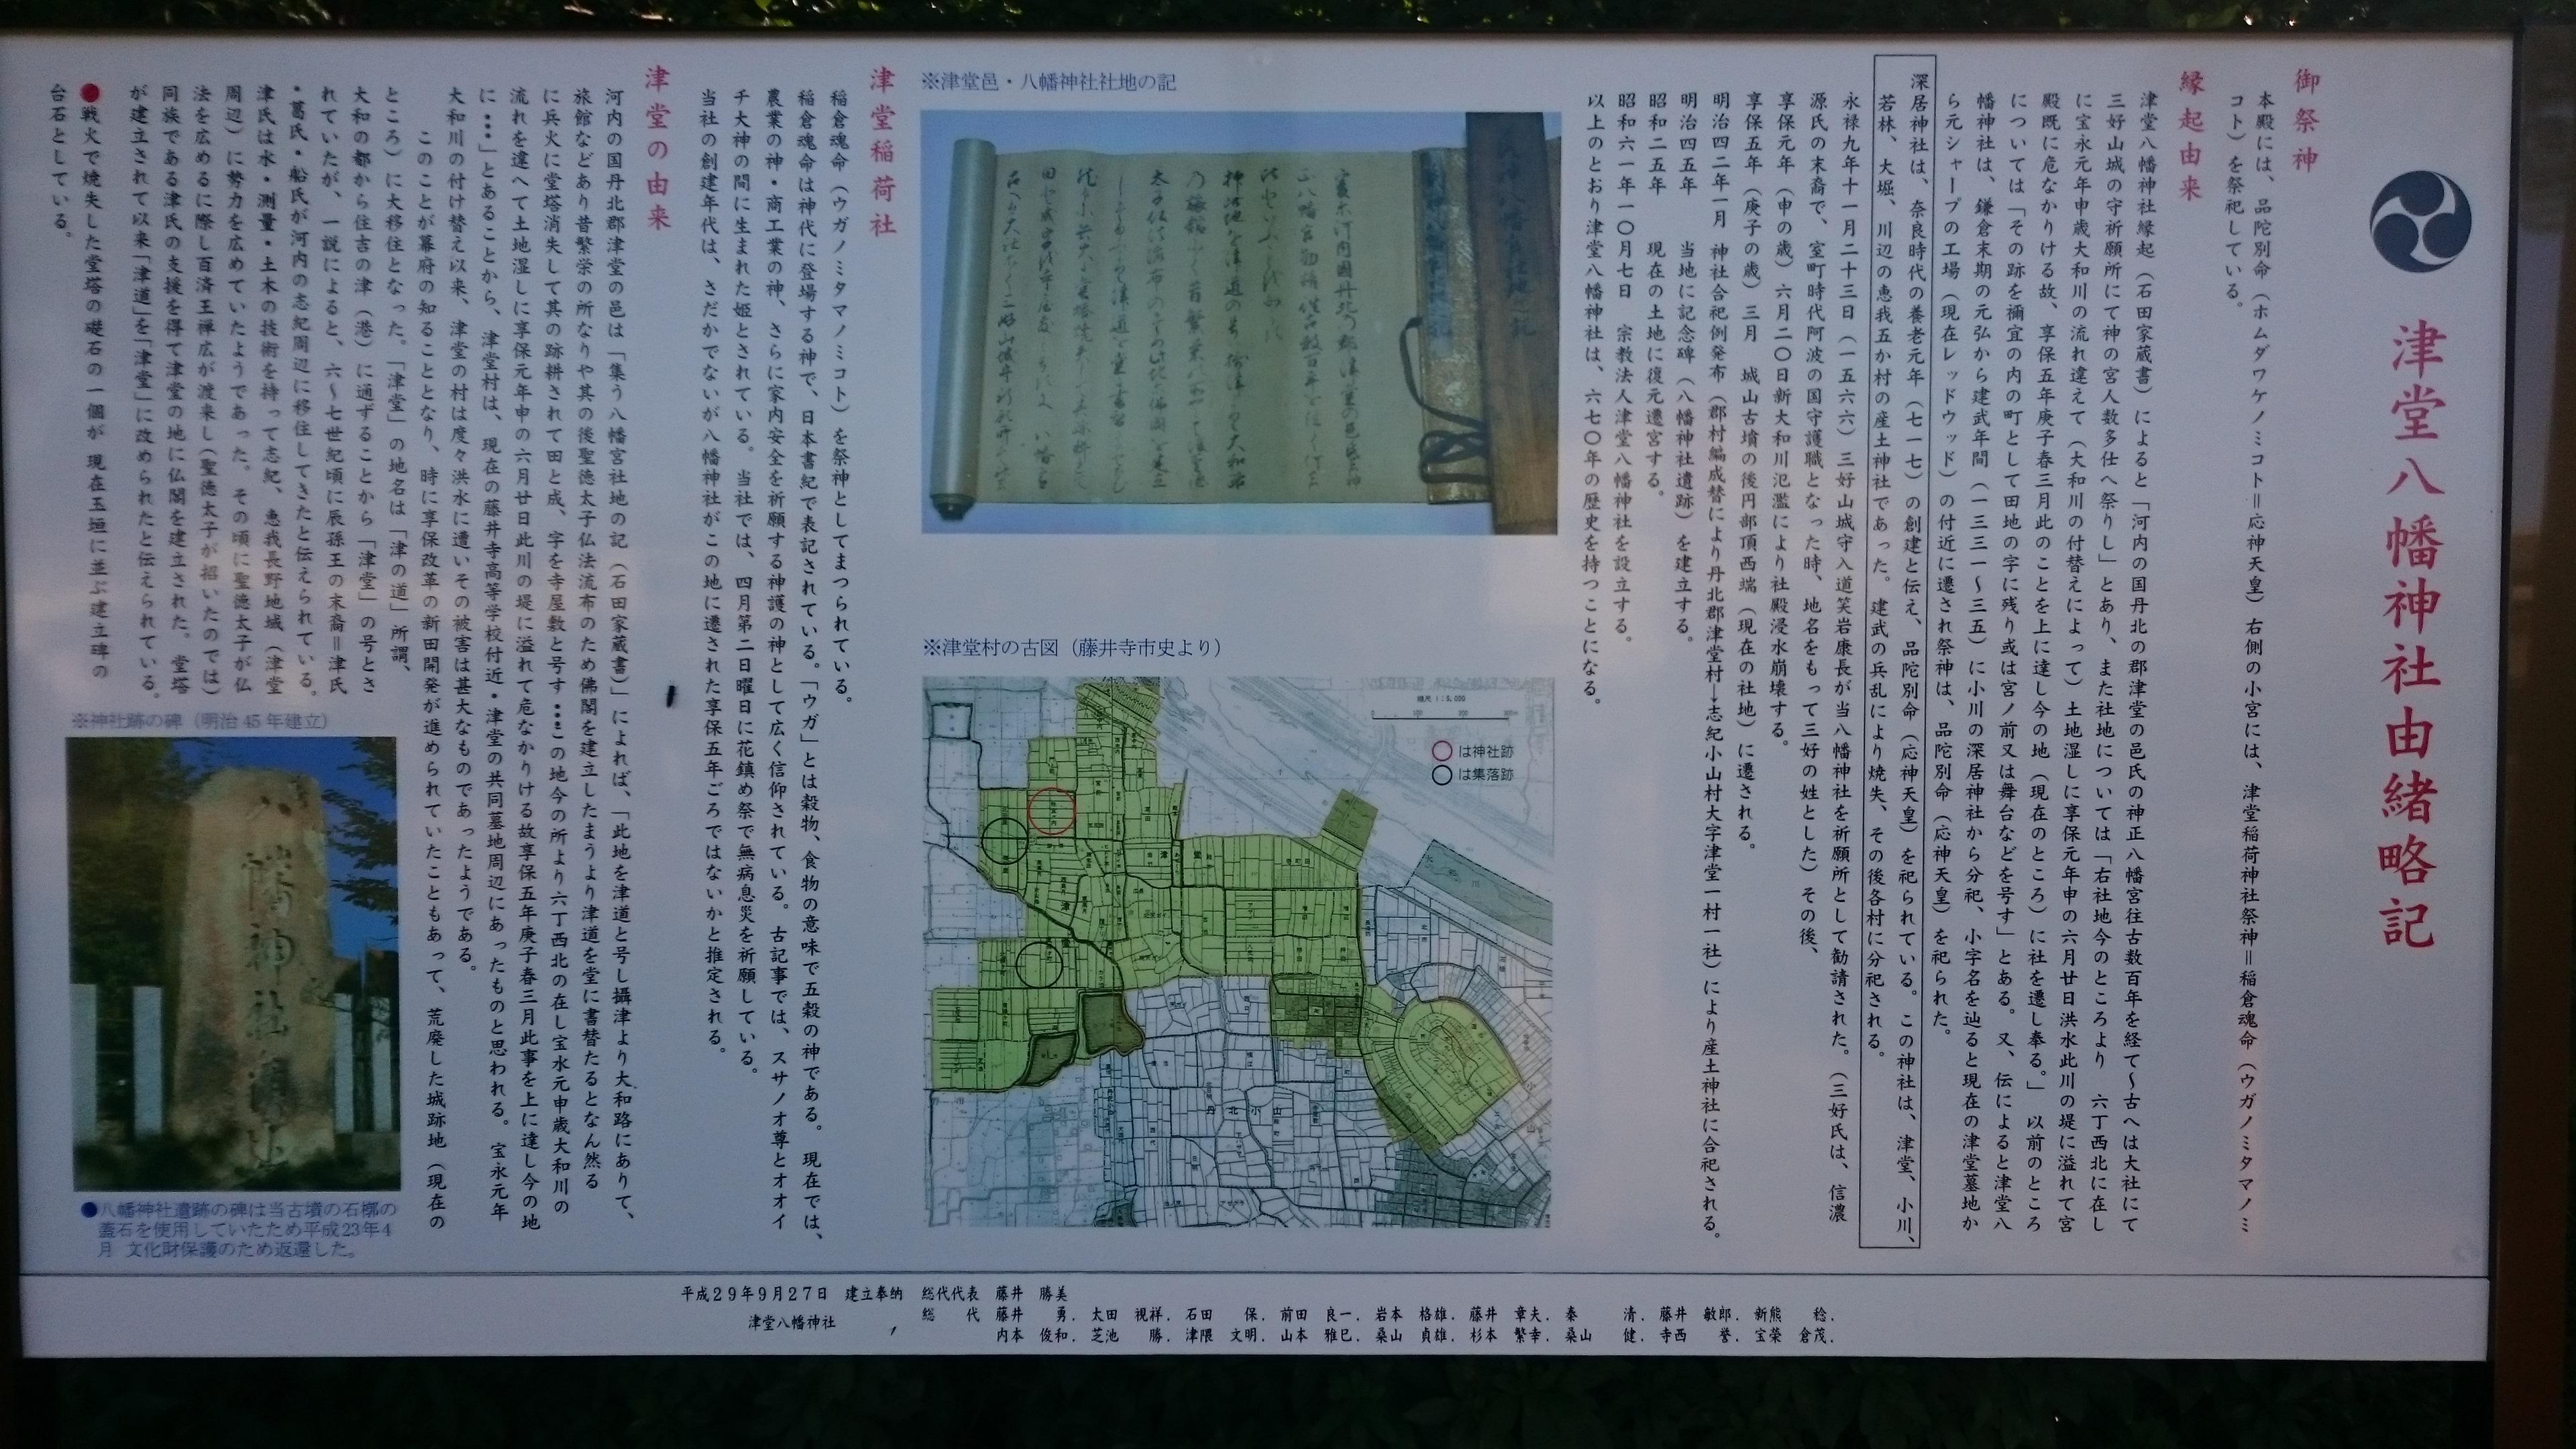 津堂八幡神社の歴史